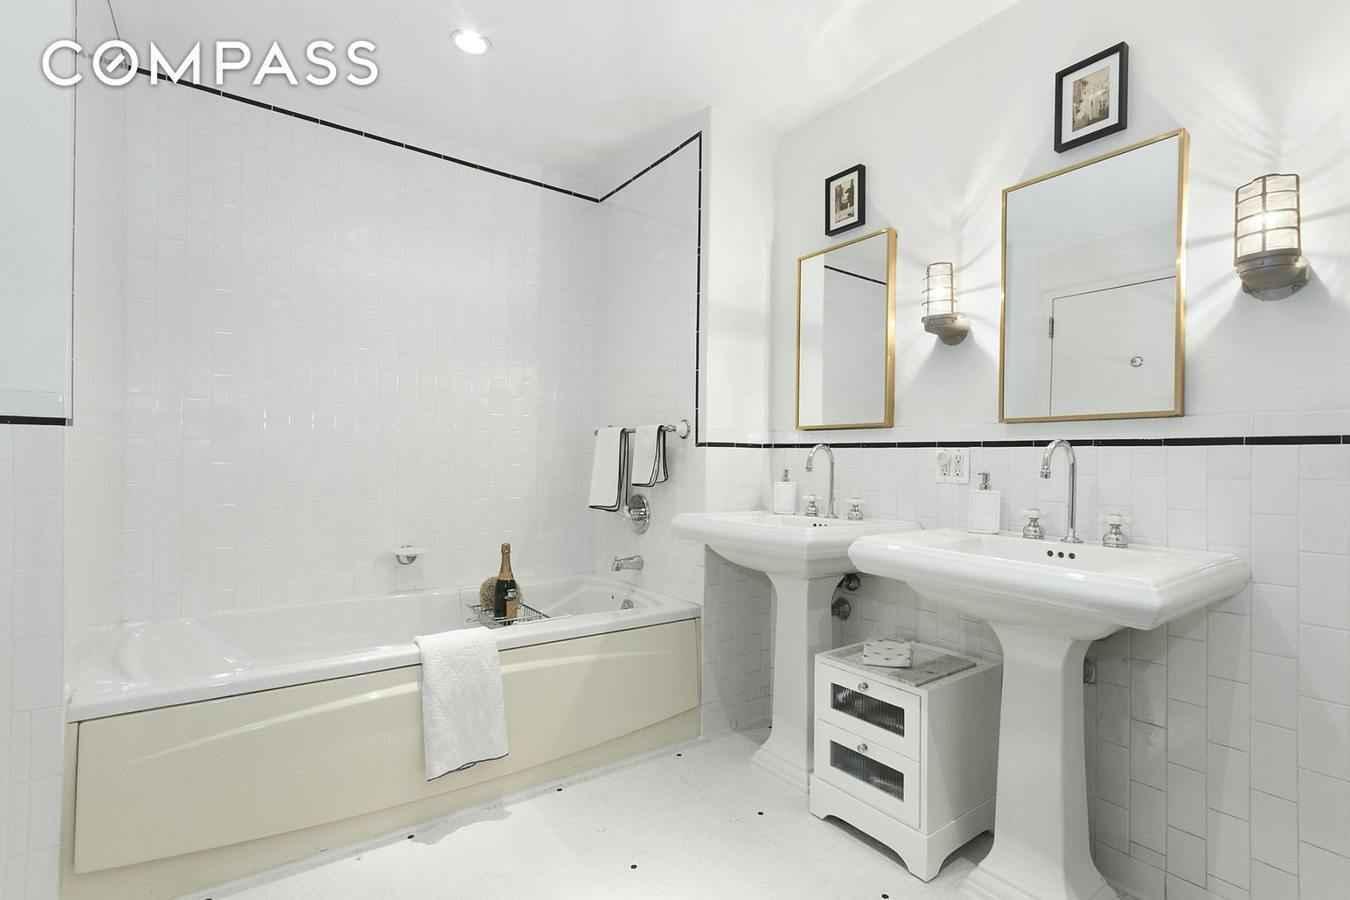 Apartment for sale at 291 Seventh Avenue, Apt 3-FLR